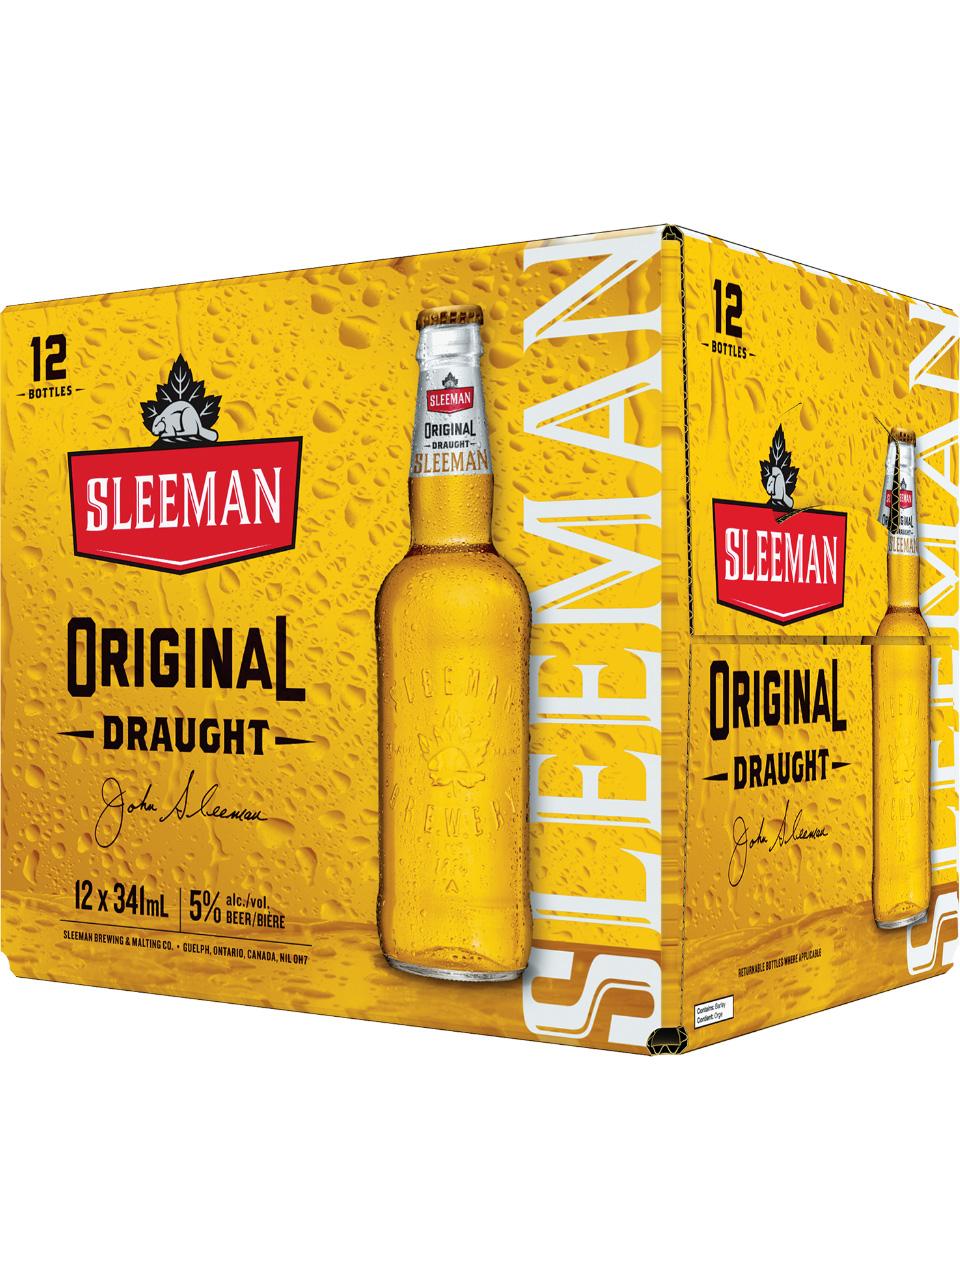 Sleeman Original Draught 12 Pack Bottles